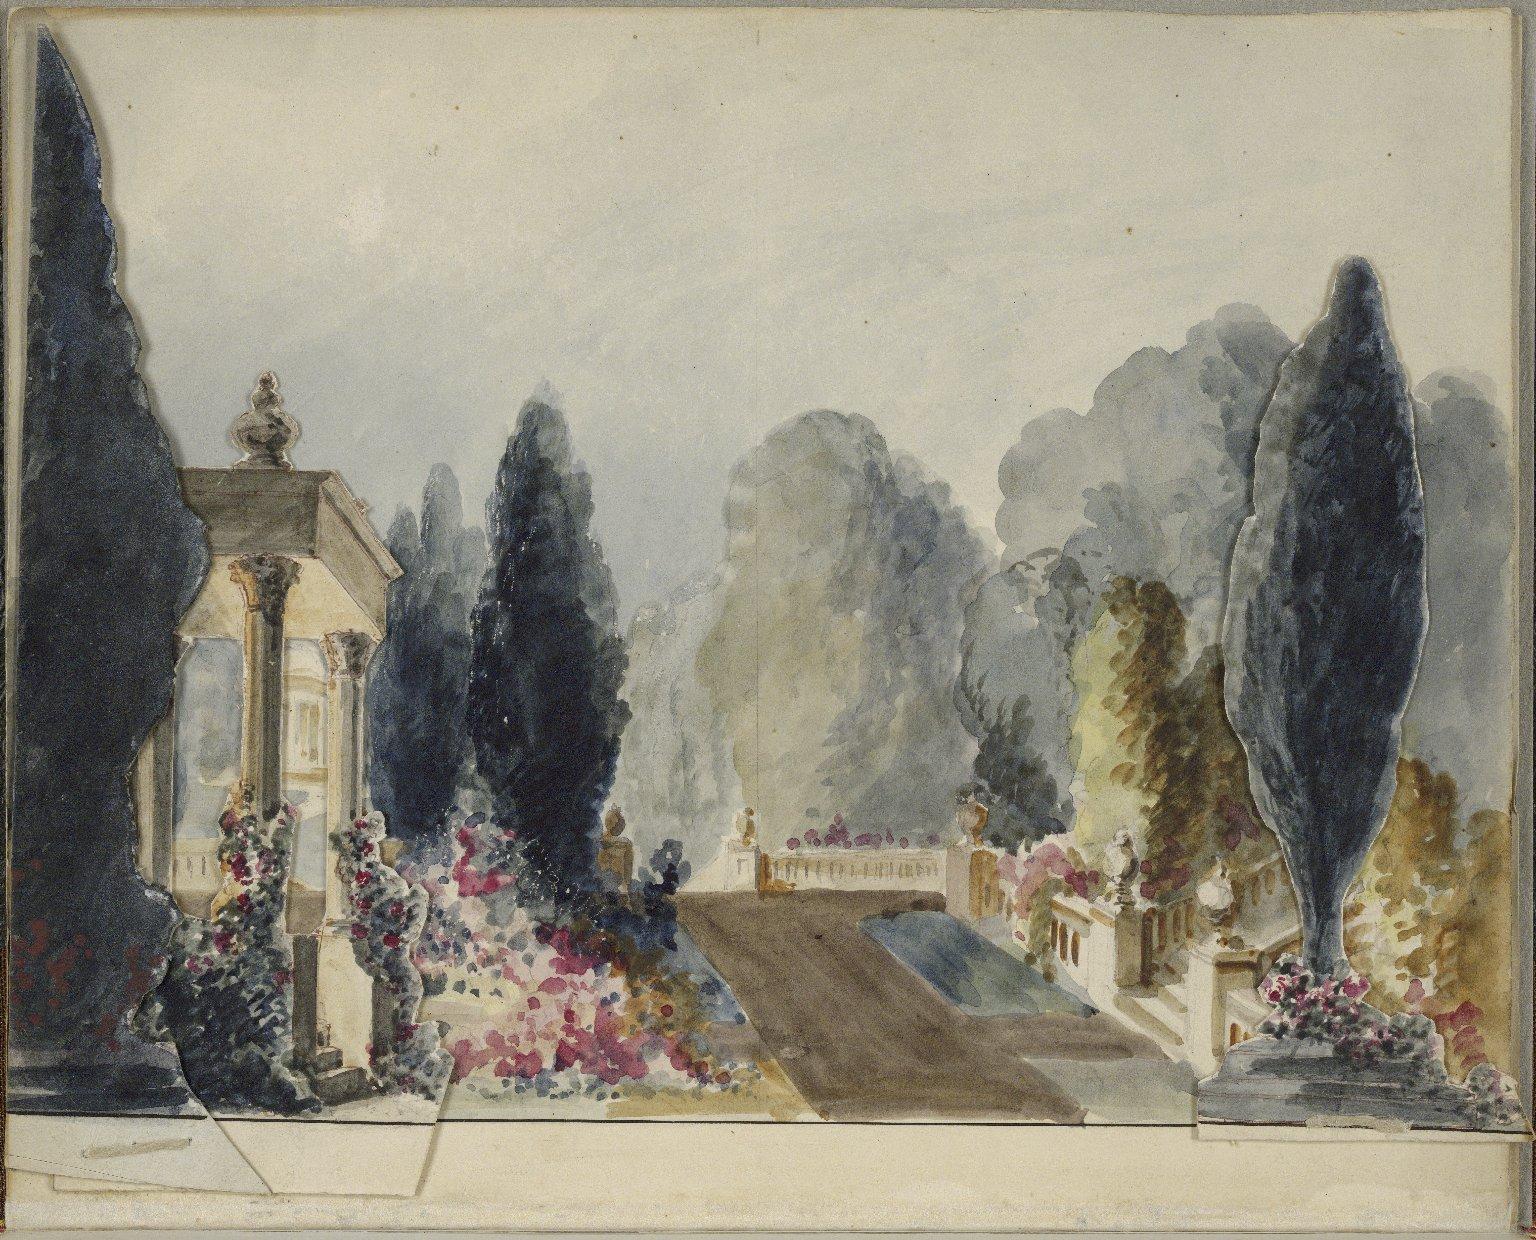 [Merchant of Venice] [Scene designs, probably Charles Marshall's originals for Macready's Drury Lane production of The merchant of Venice]